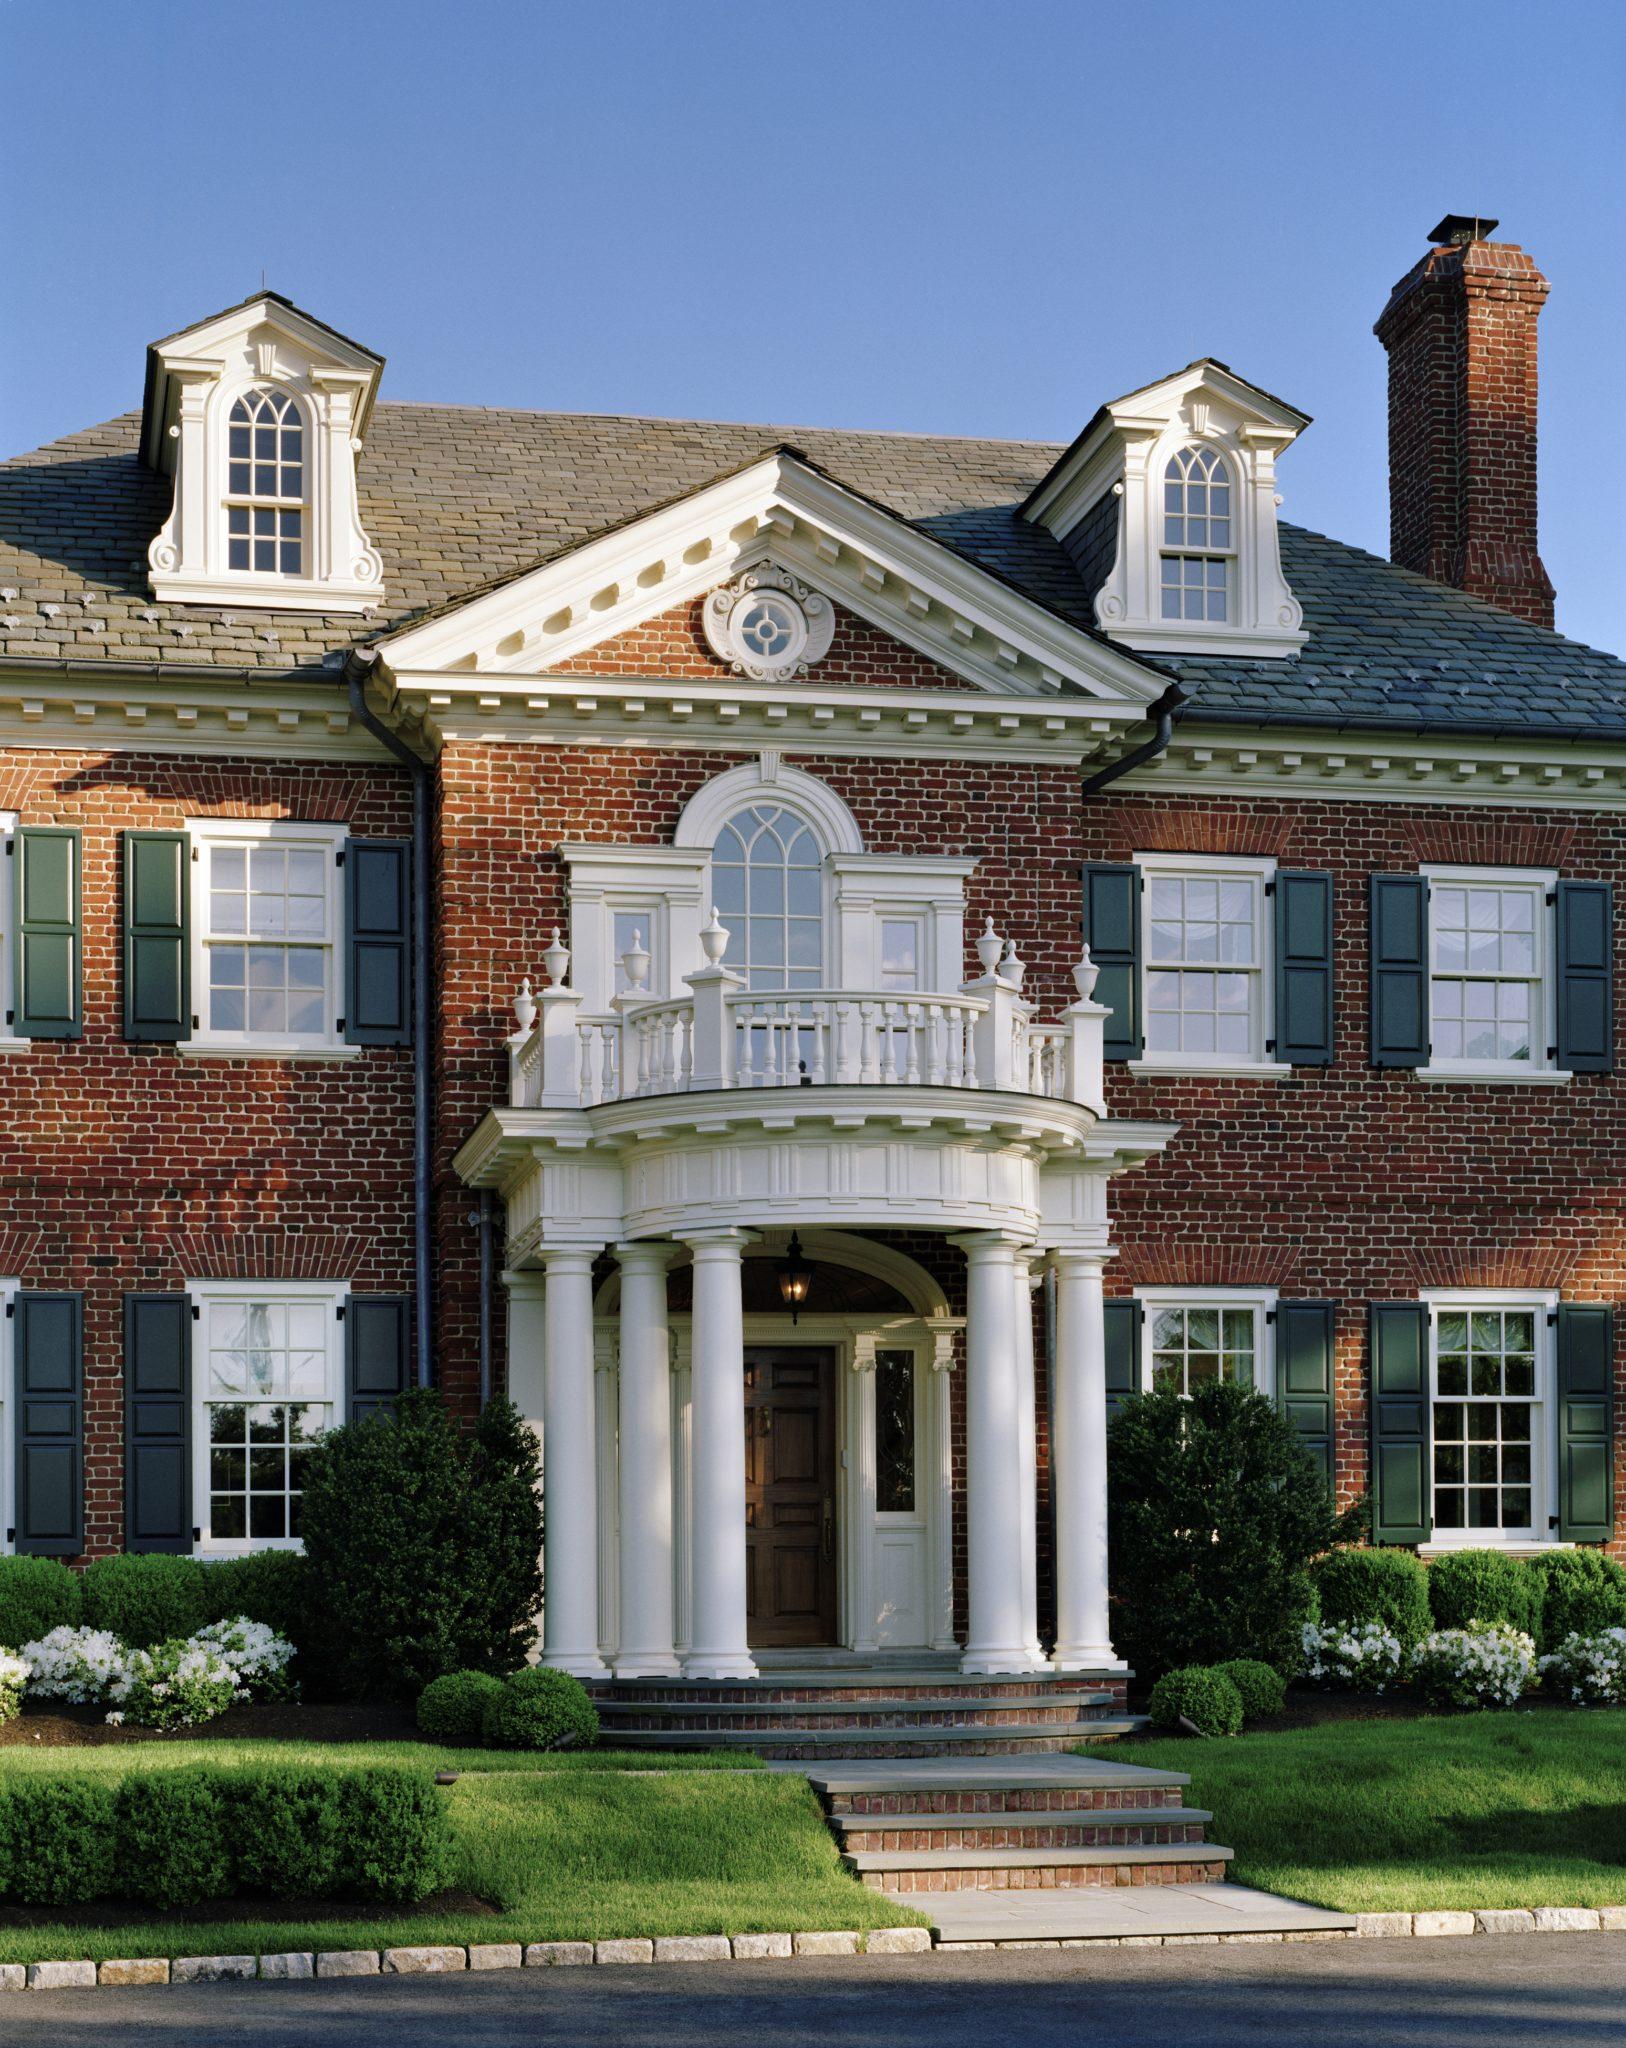 American Brick Georgian Entry Portico by Charles Hilton Architects